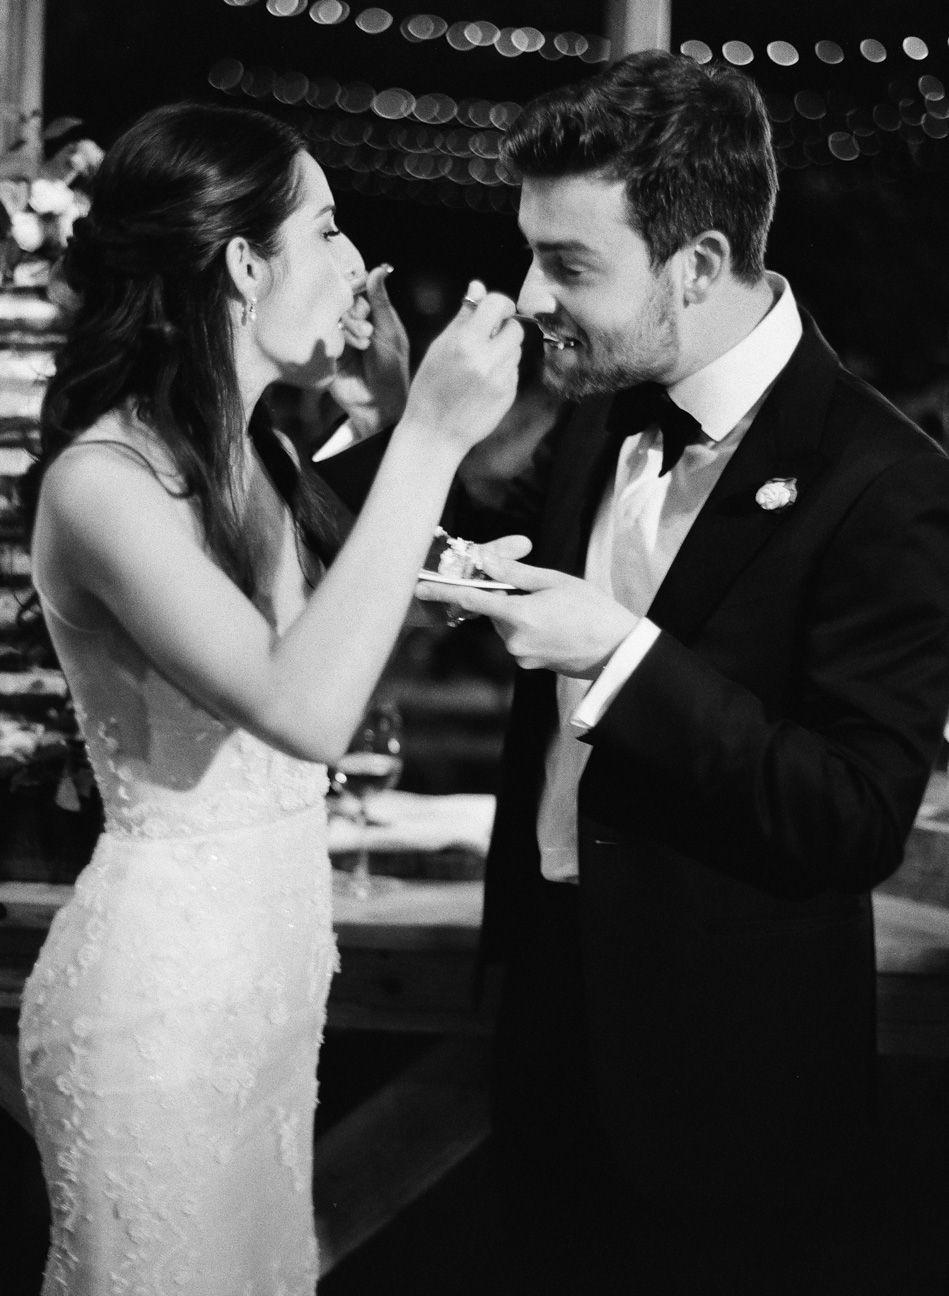 KarenHillPhotography-Parizat-Wedding-1183.jpg